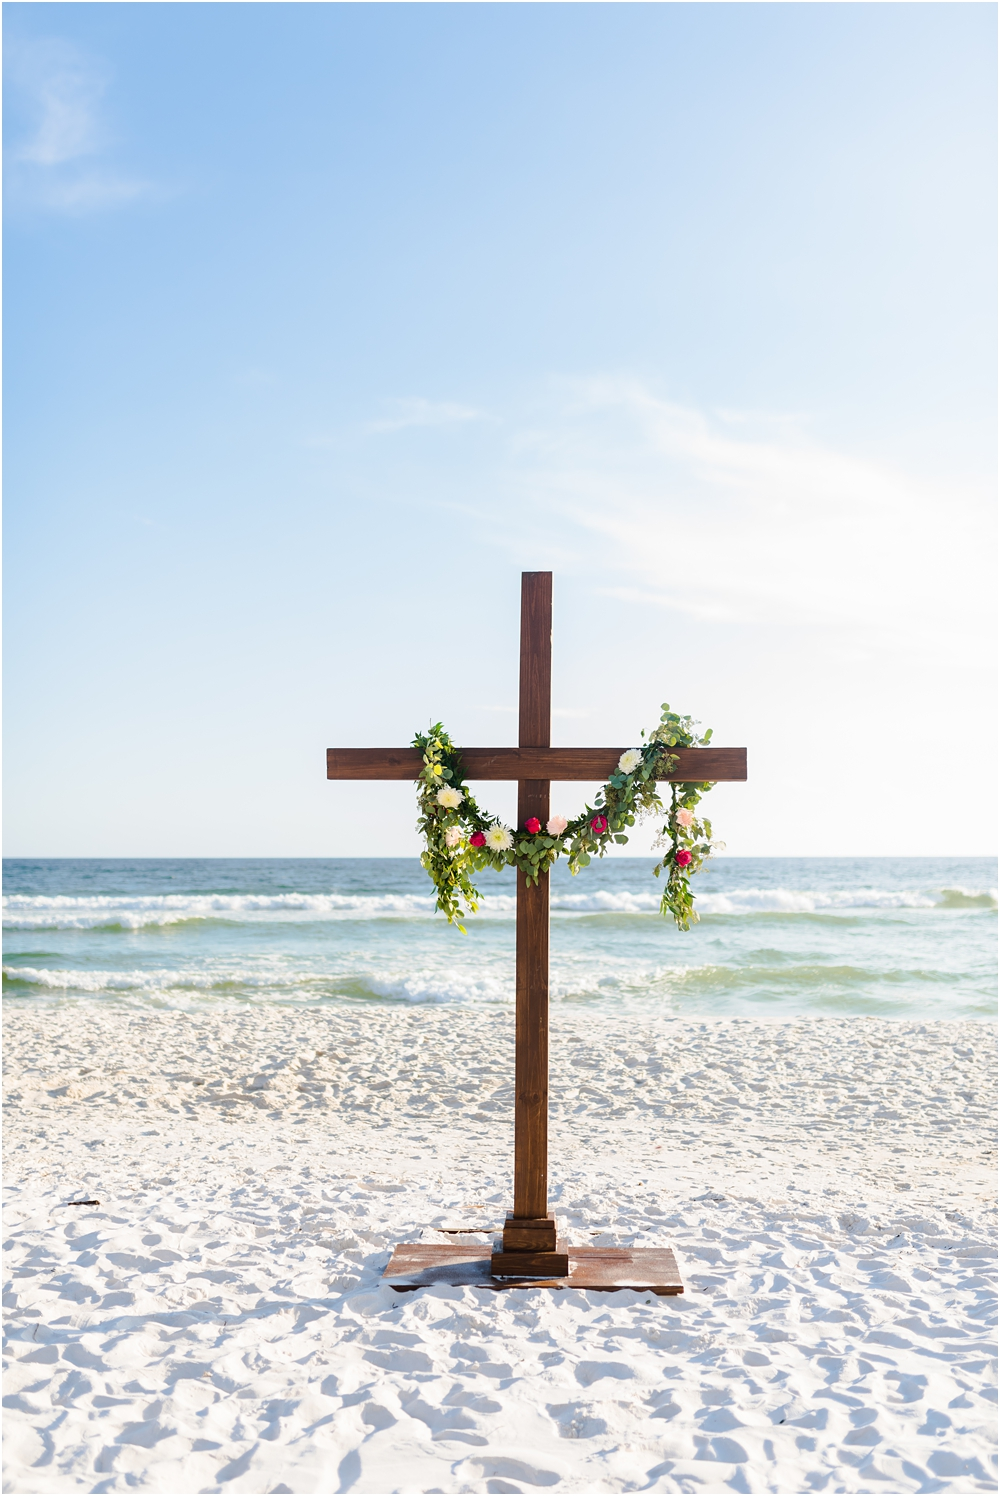 mcglothlin-wedding-kiersten-stevenson-photography-30a-panama-city-beach-dothan-tallahassee-(74-of-145).jpg